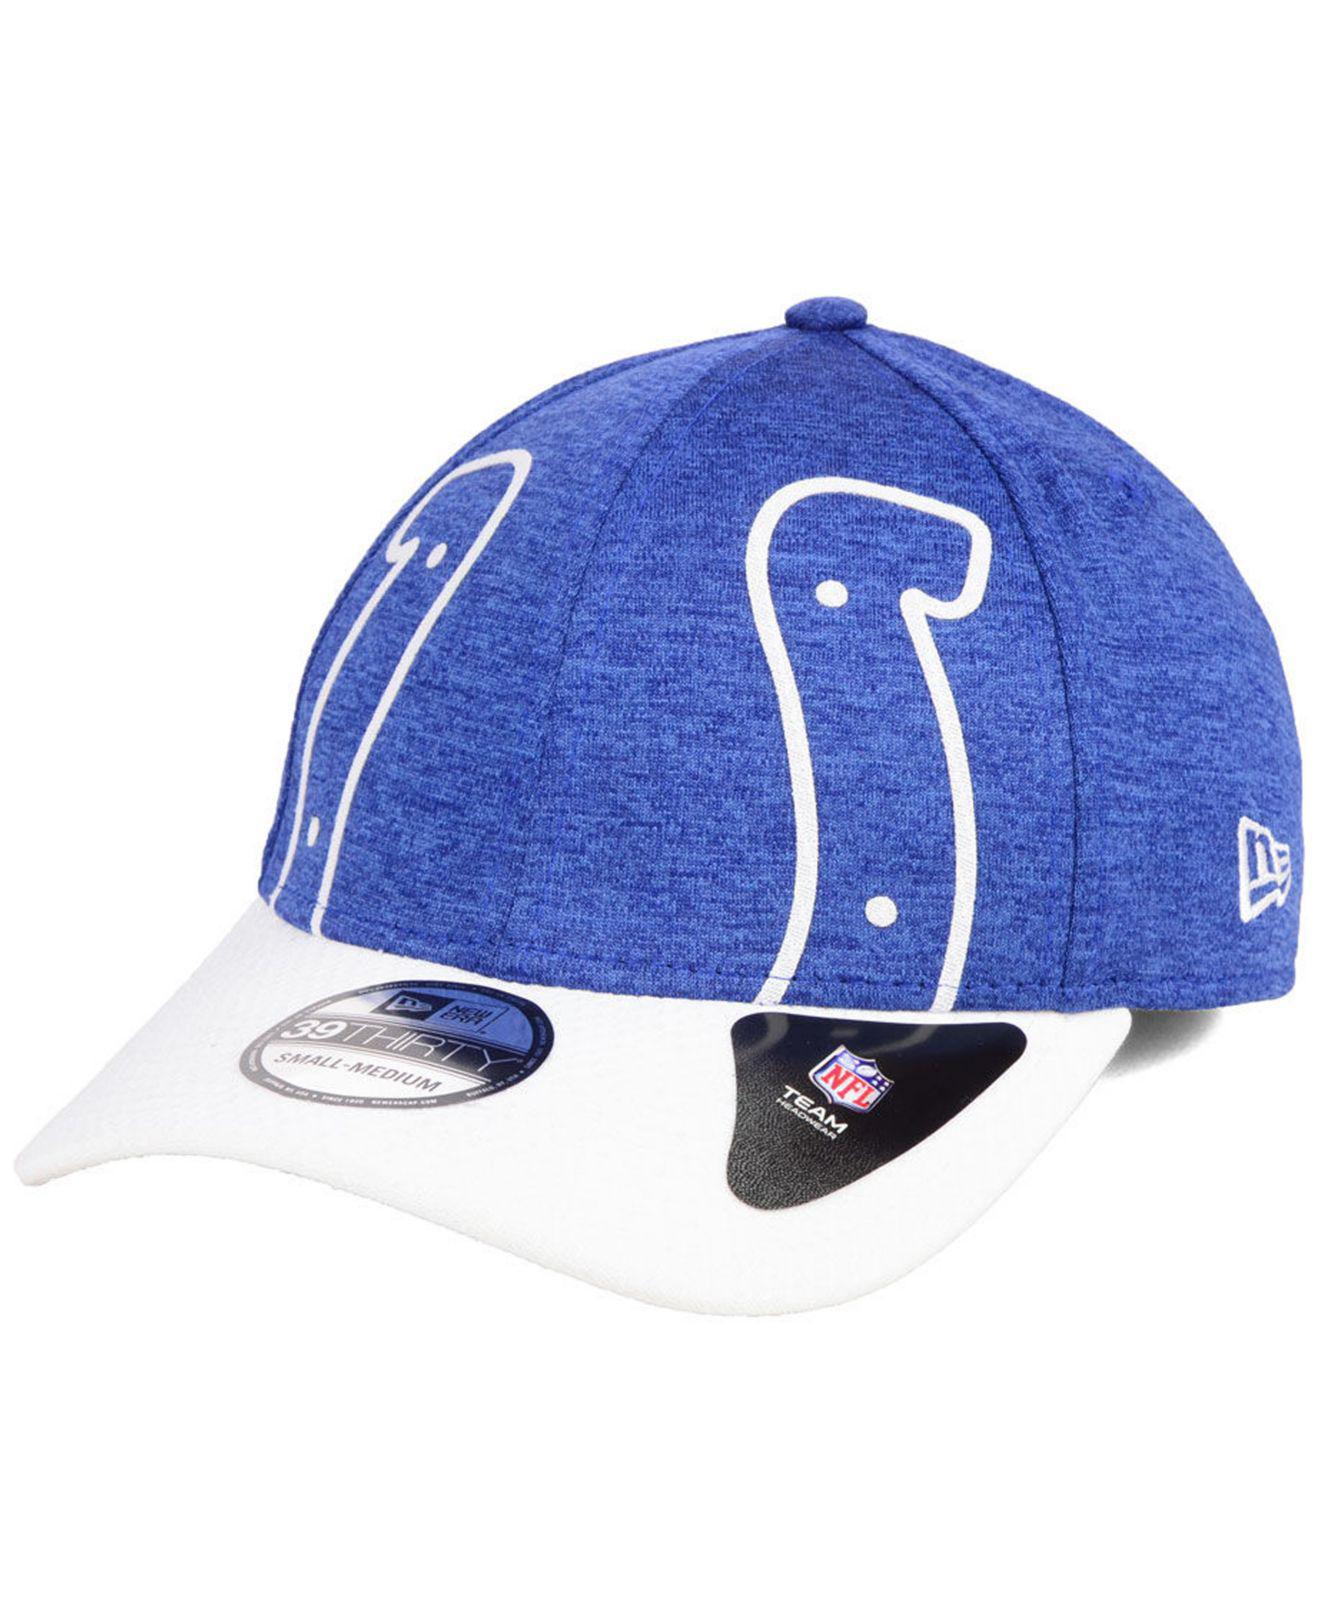 62989ab471c Lyst - KTZ Indianapolis Colts Oversized Laser Cut Logo 39thirty Cap ...